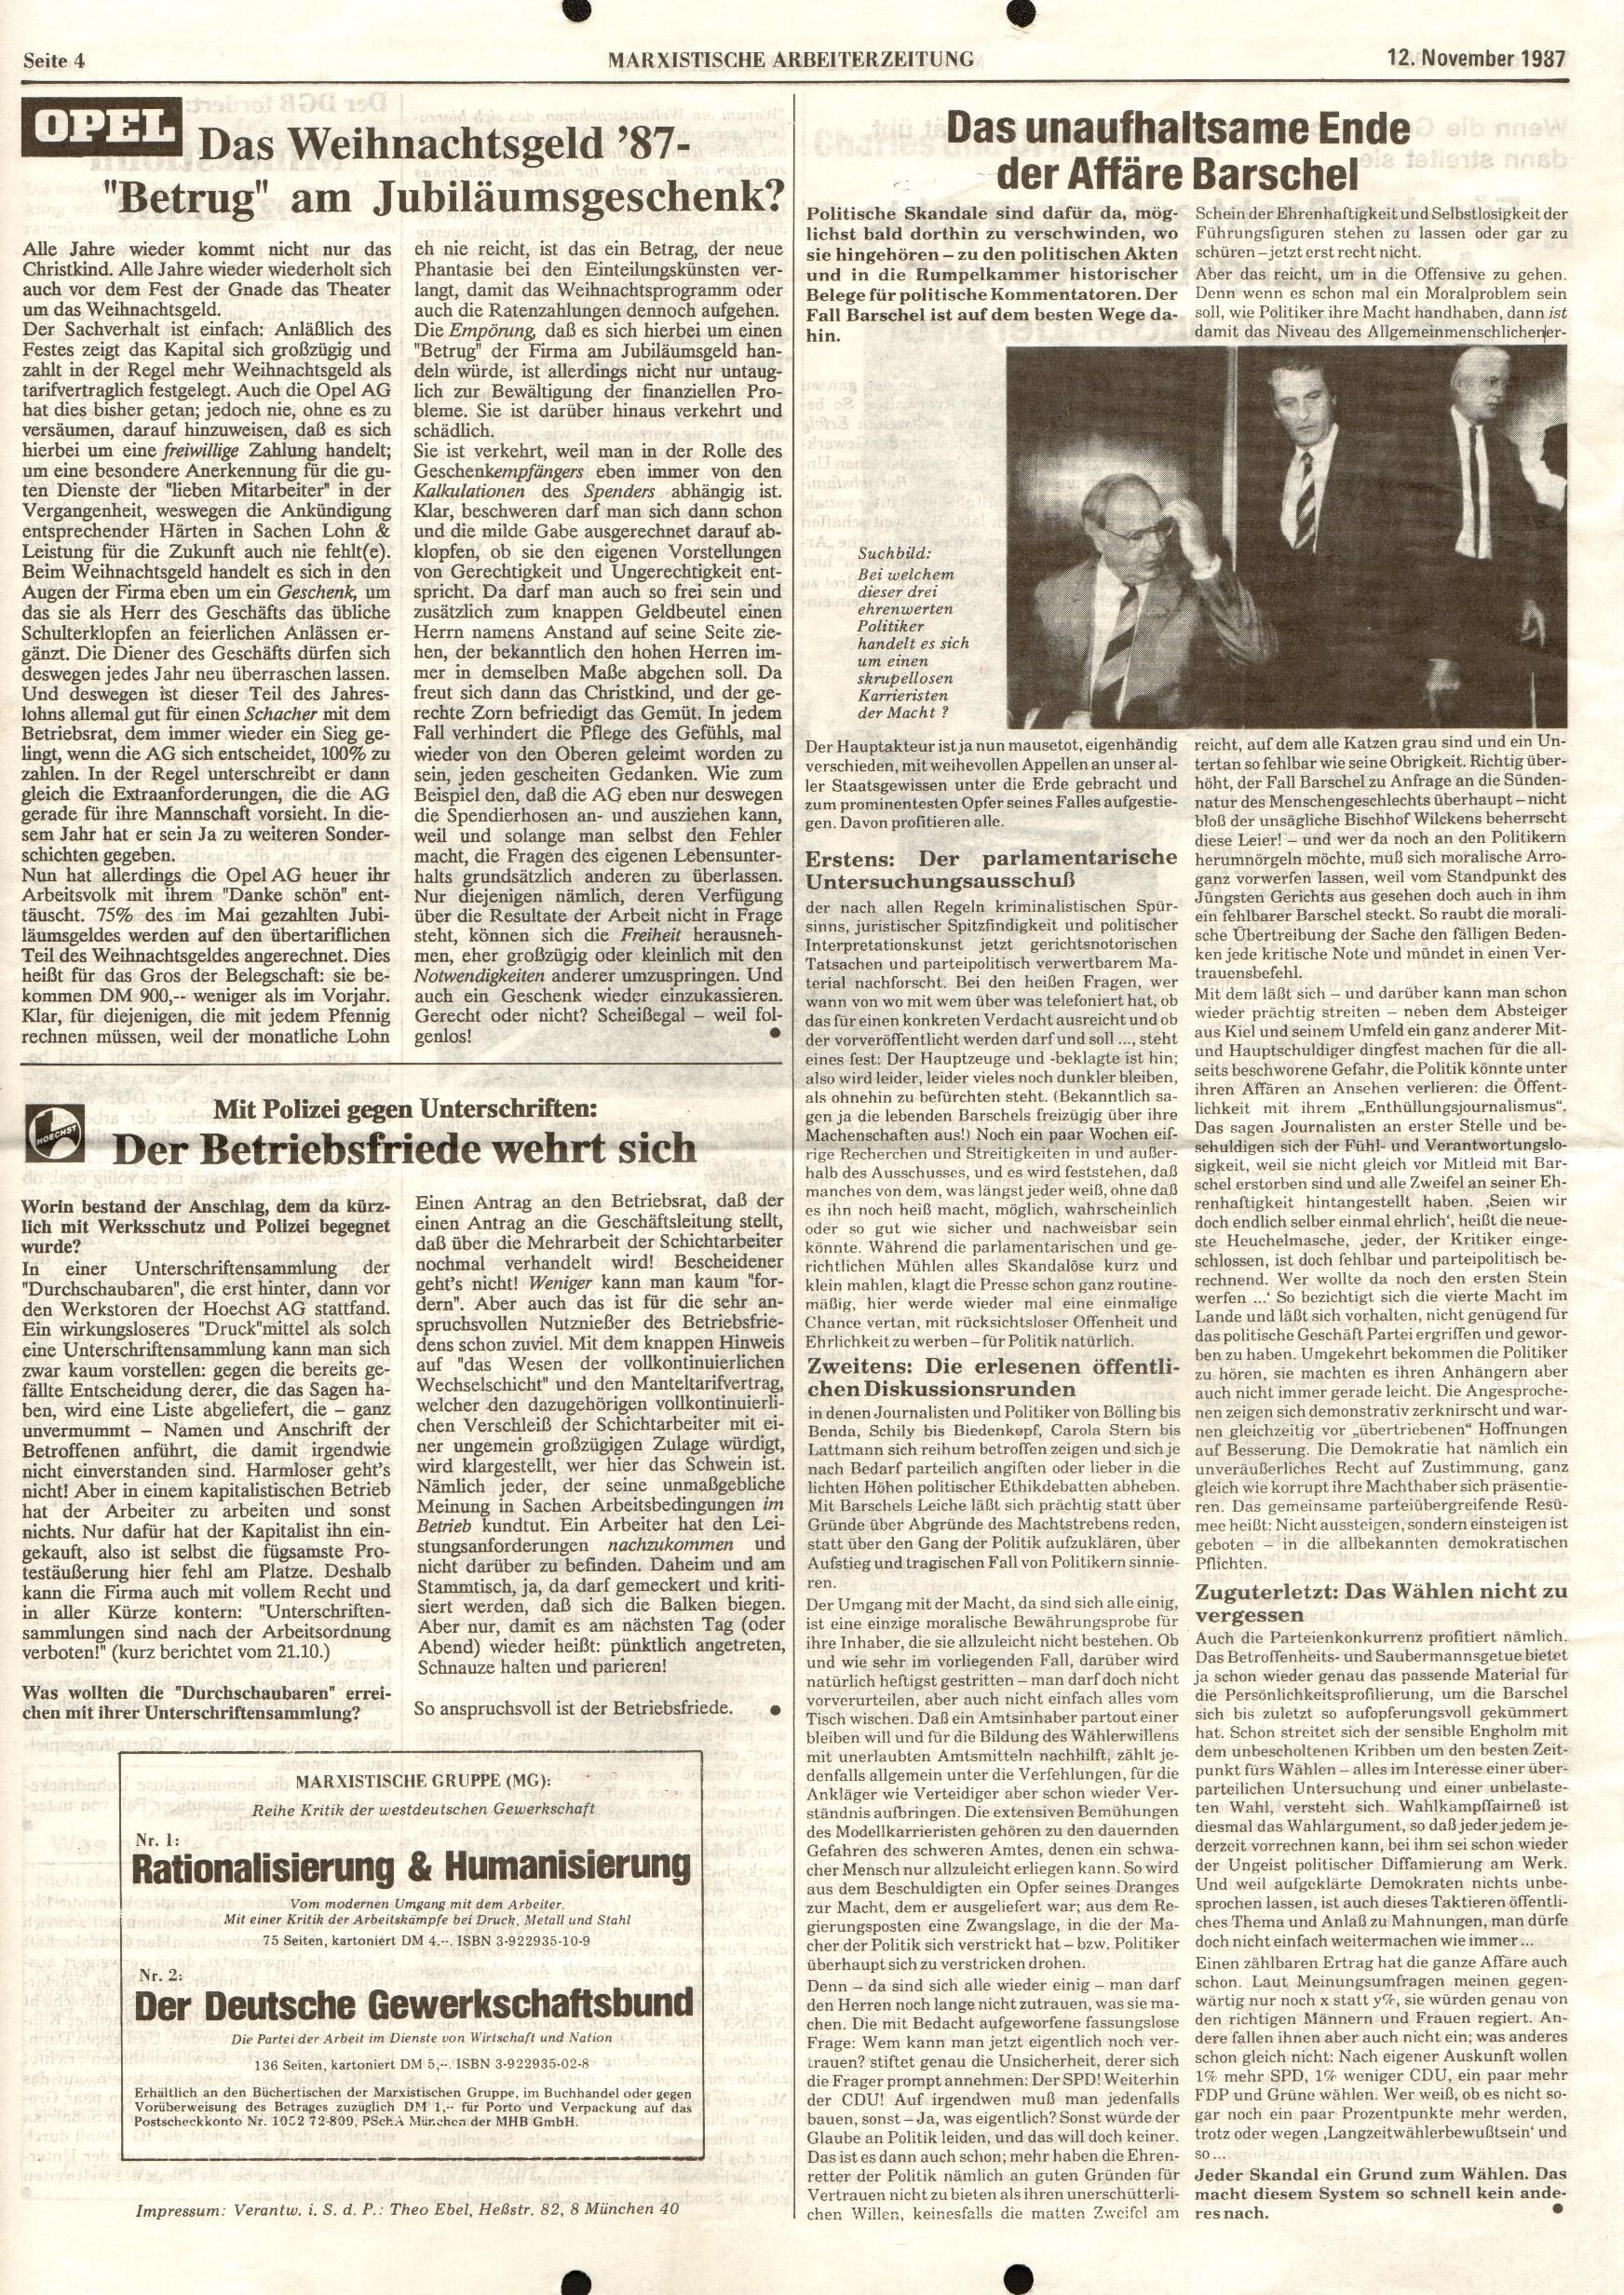 Frankfurt_CPK_Hoechst_MAZ480